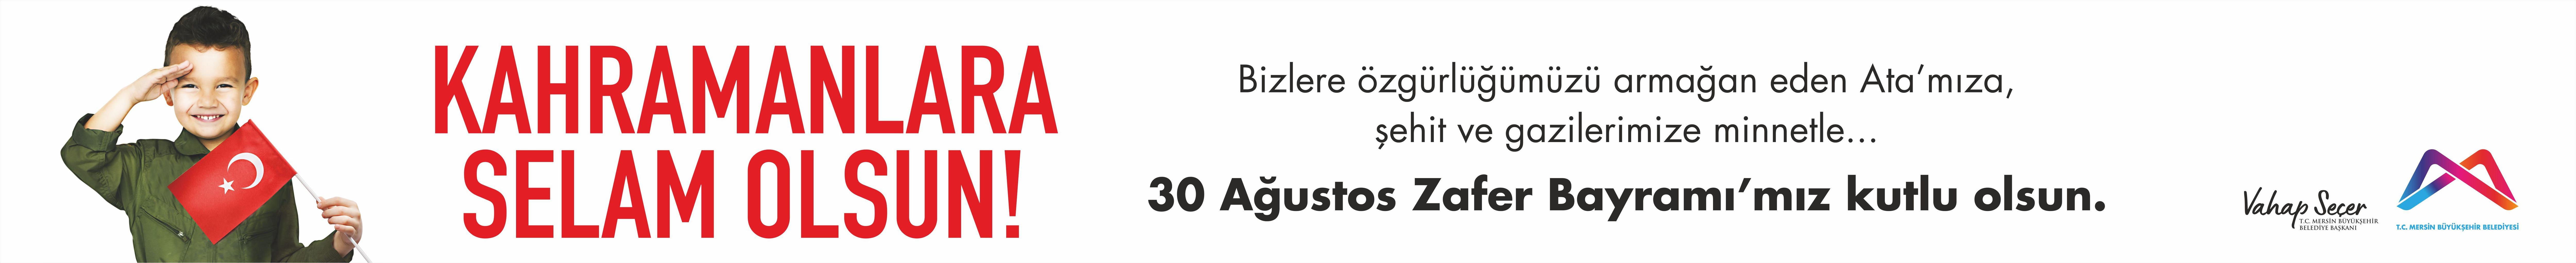 30 Ağustos